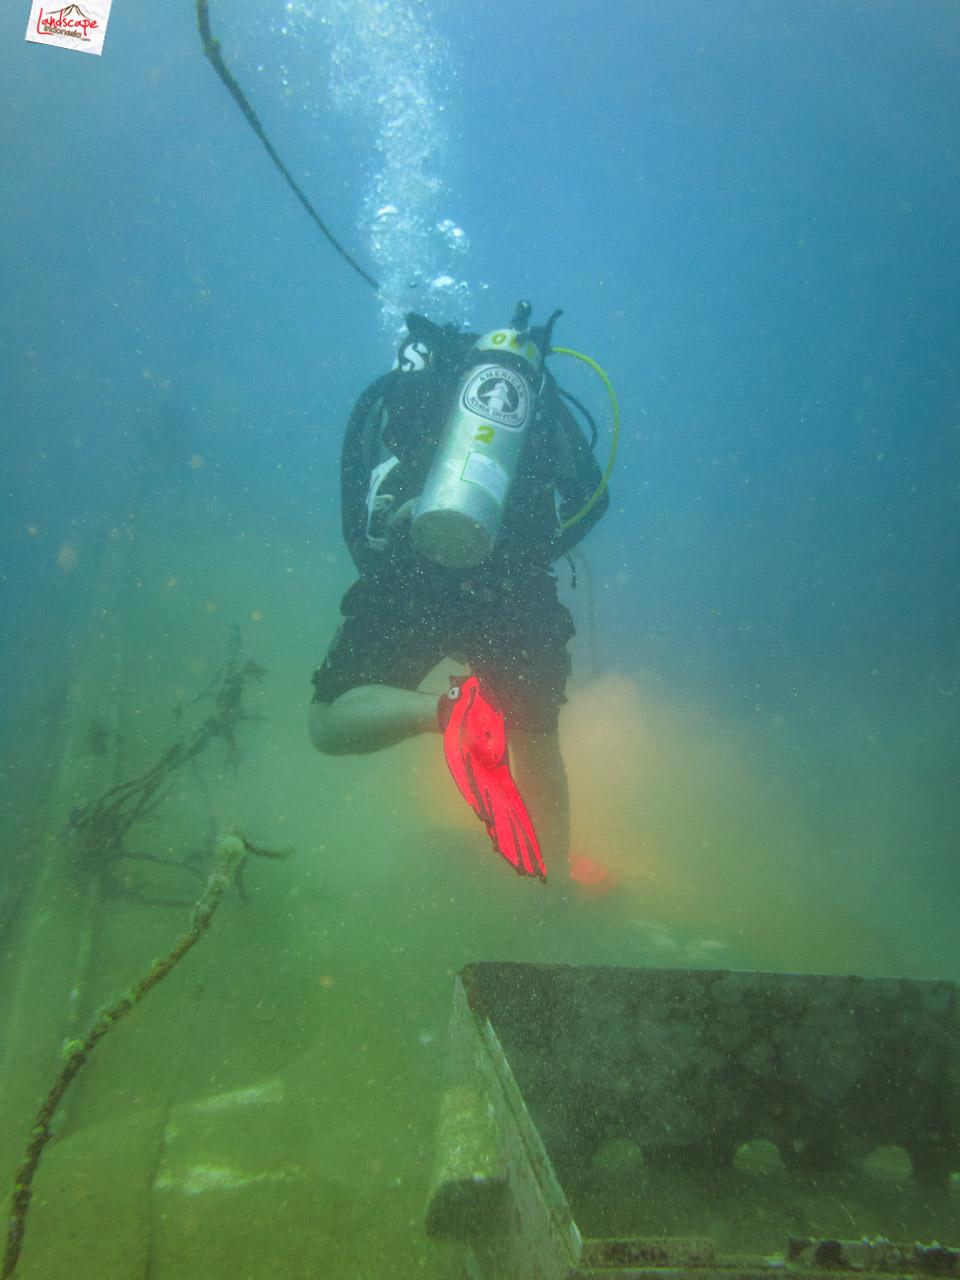 wreck dive kapal ahok 15 - Wreck Dive Kapal Ahok